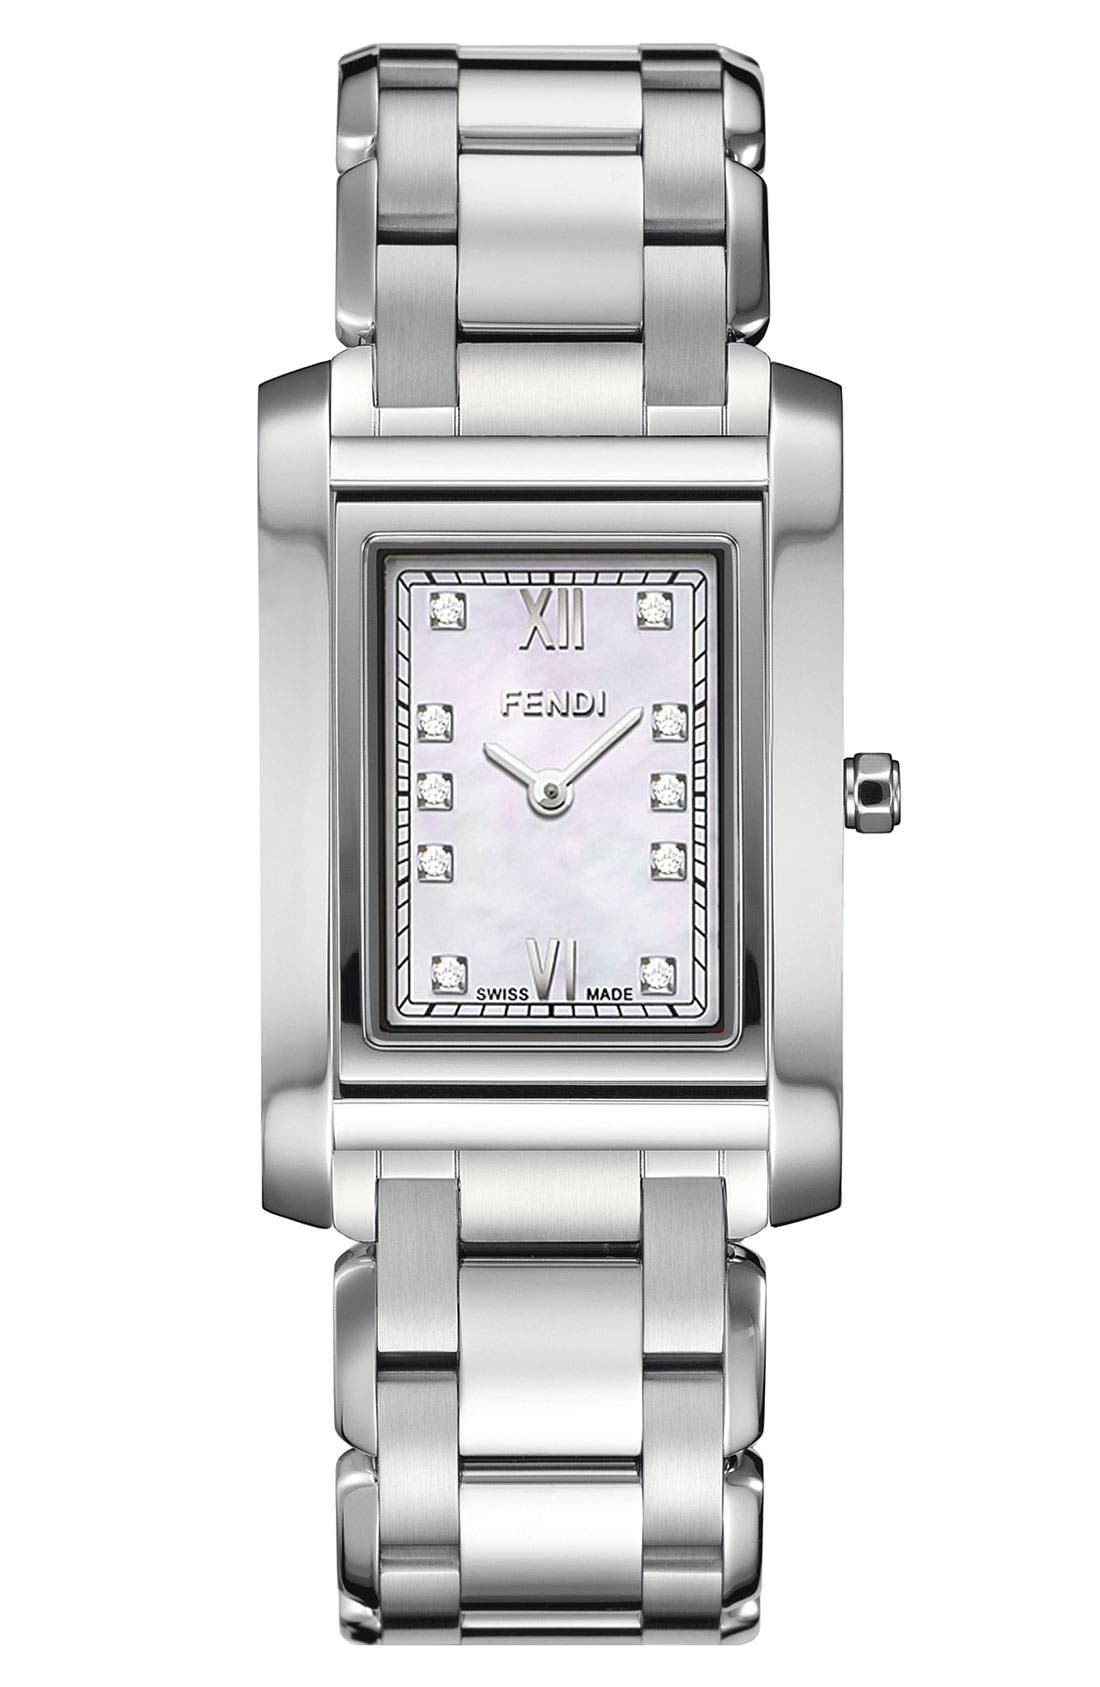 Main Image - Fendi 'Loop - Small' Diamond Dial Watch, 21mm x 34mm